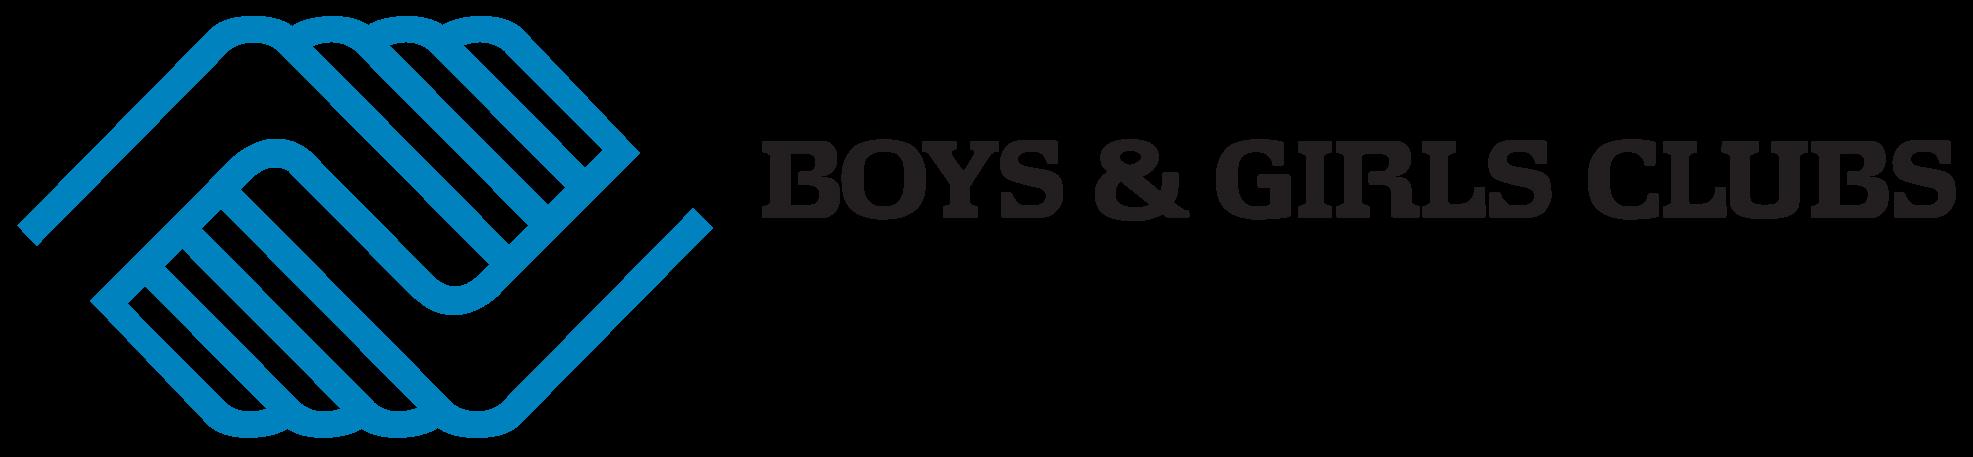 Boys & Girls Club of Crittenden County